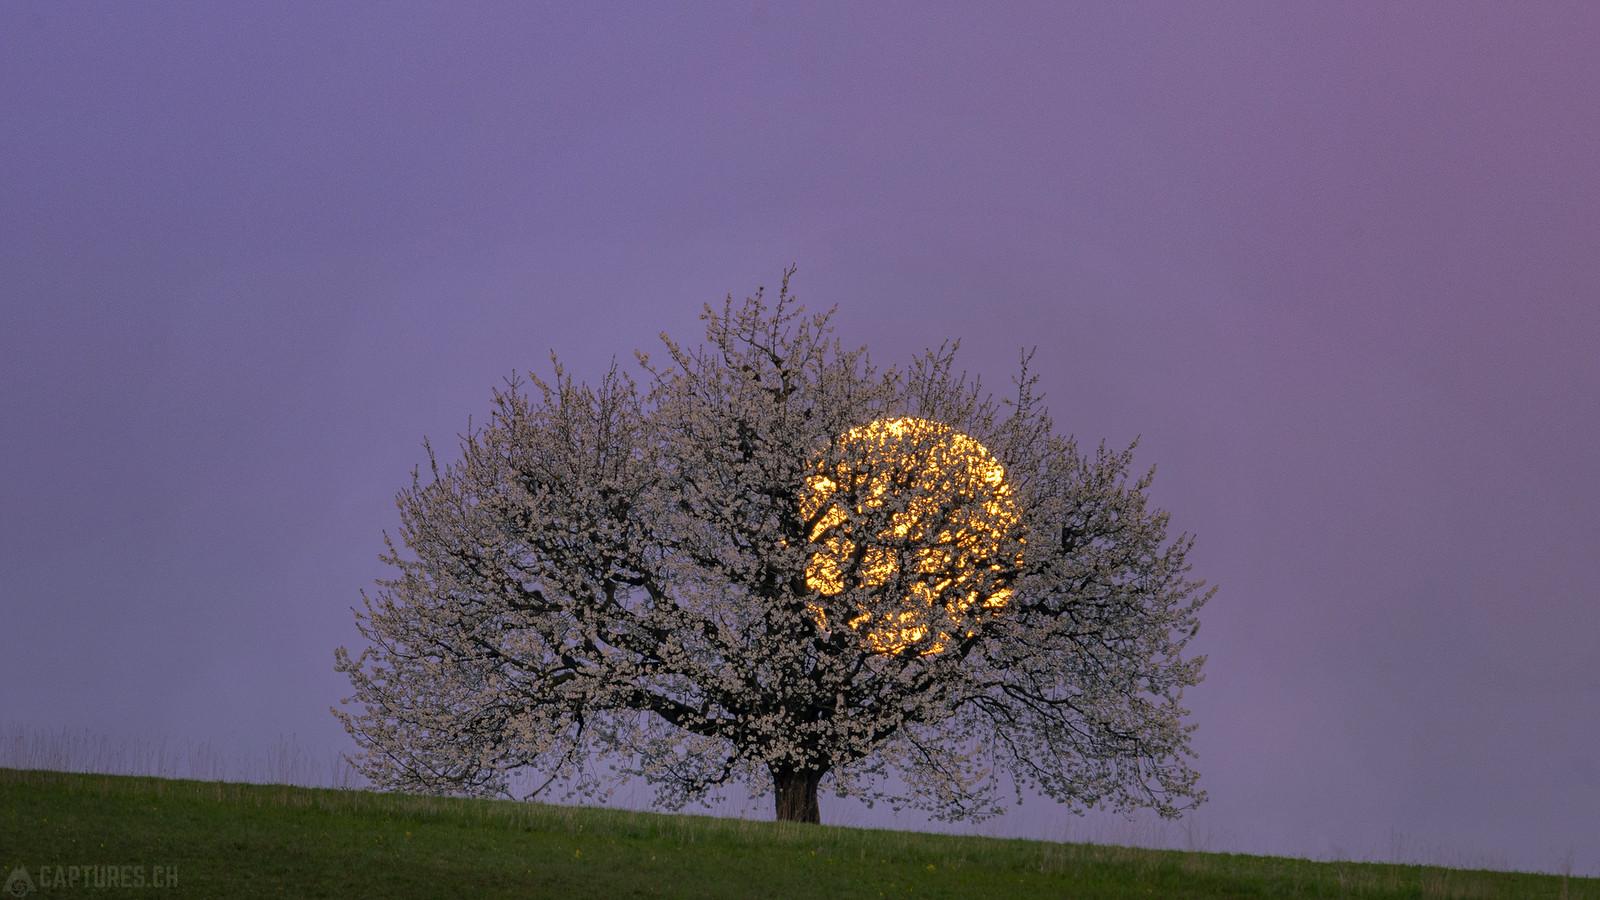 Monn behind the cherry tree - Buus